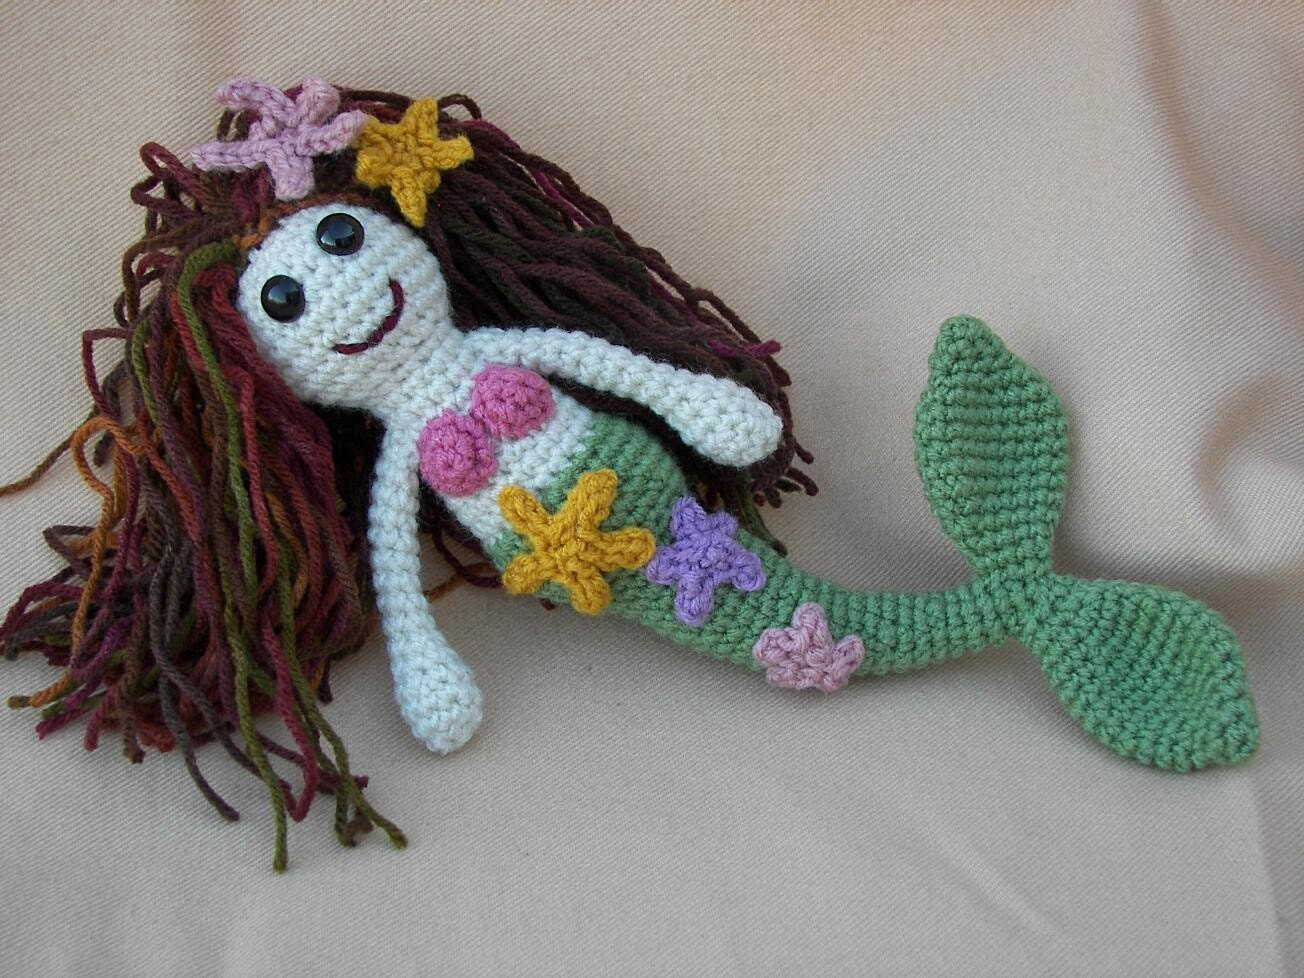 Amigurumi Mermaid Pattern : Myra Mermaid Crochet Amigurumi Pattern by CraftyDebDesigns ...